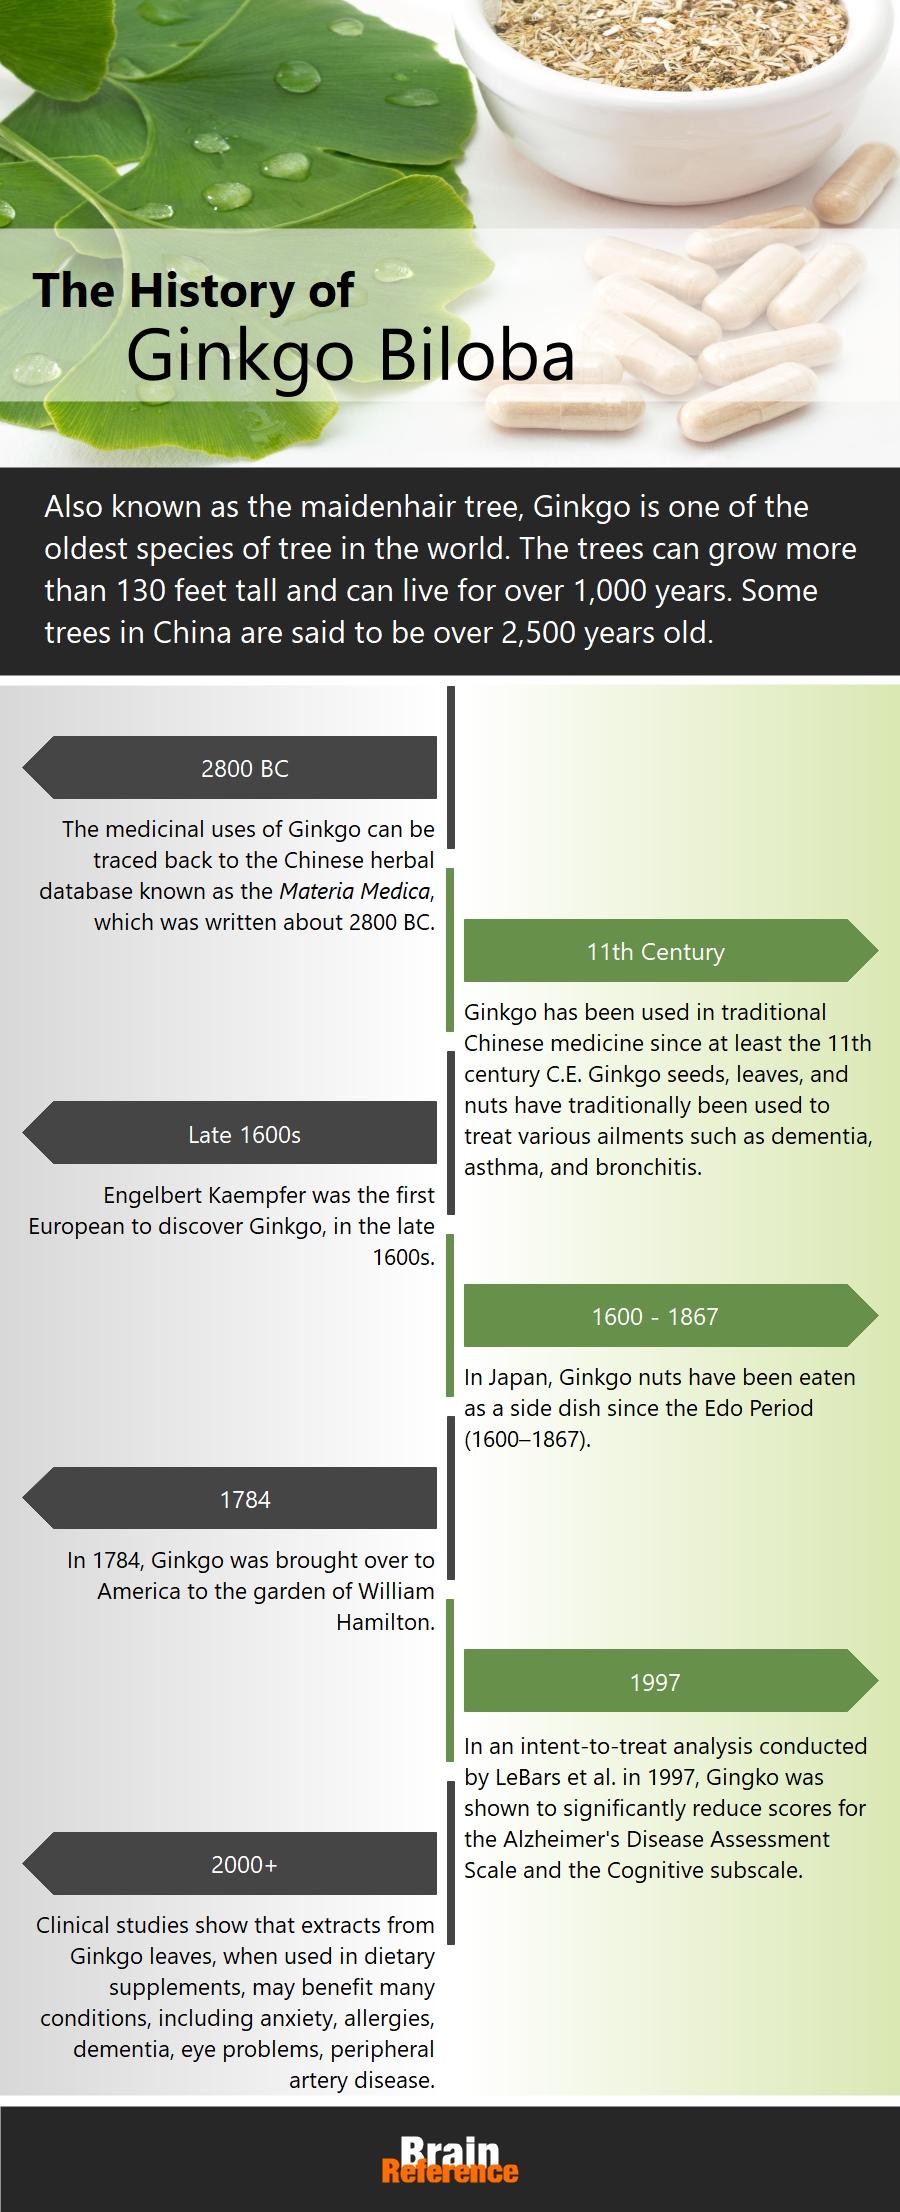 NeuroIgnite-Havasu-Nutrition-Ginkgo-Biloba-History